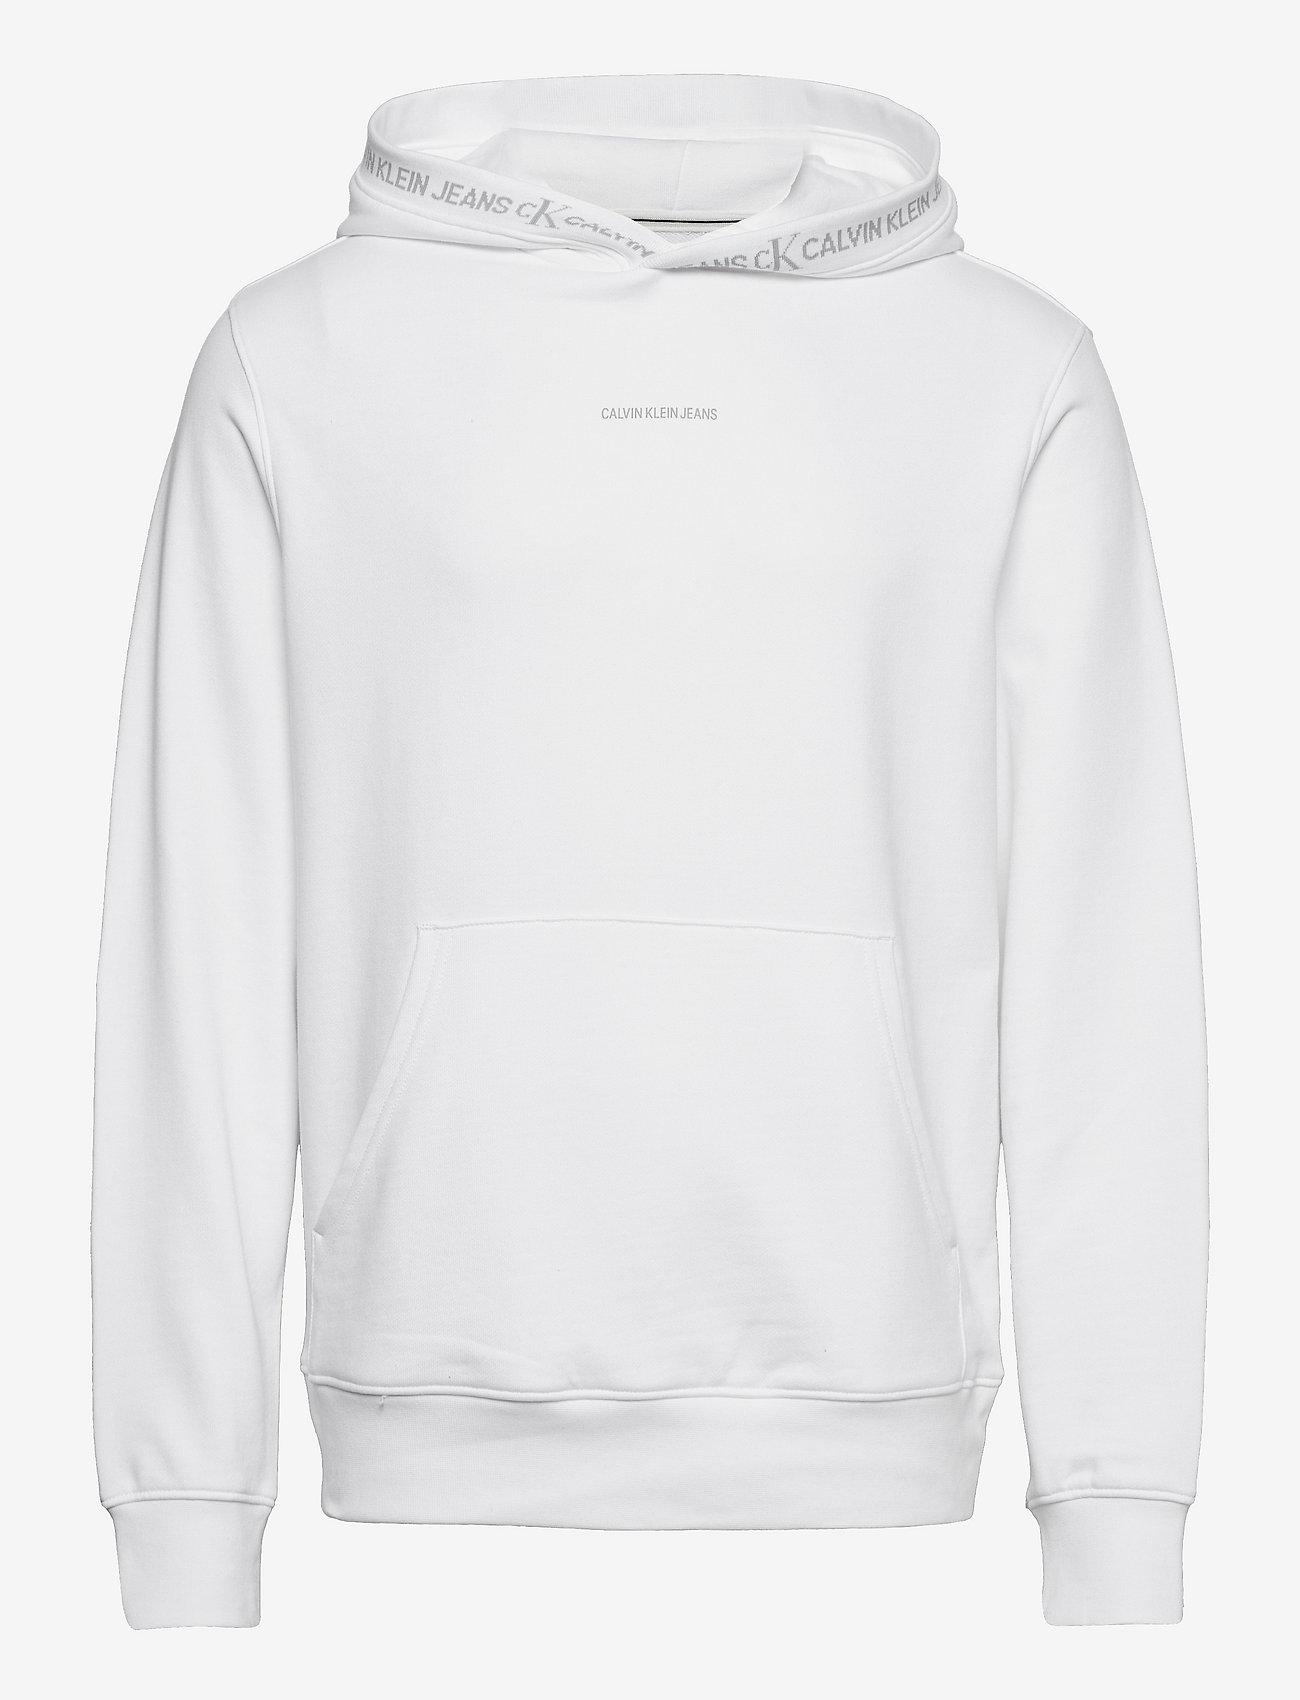 Calvin Klein Jeans - LOGO JACQUARD HOODIE - sweats à capuche - bright white - 0